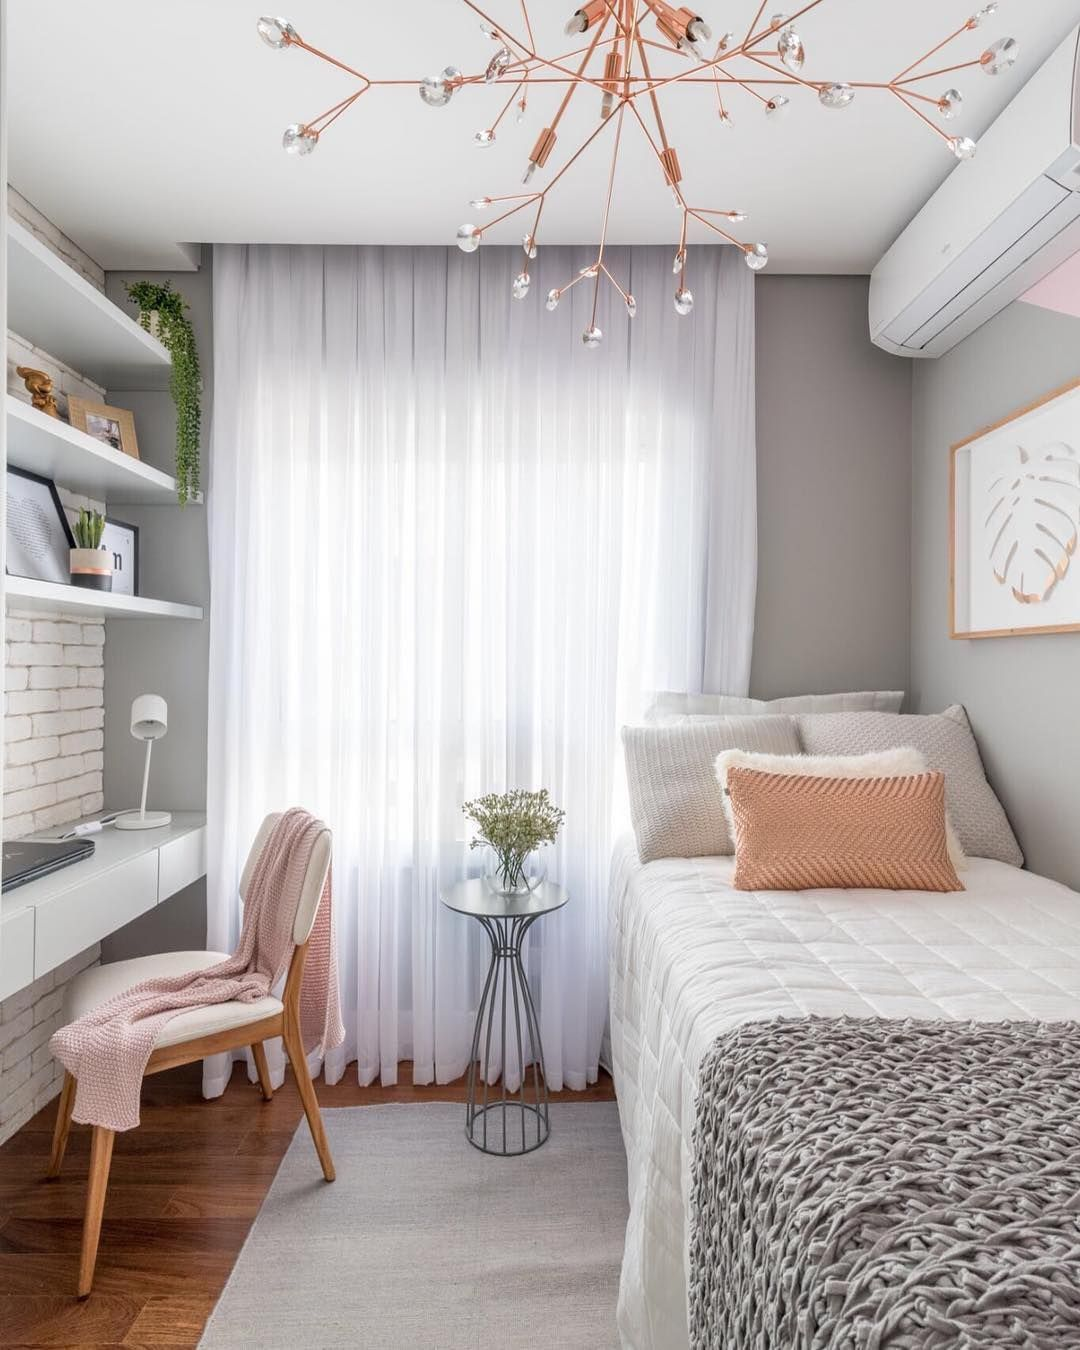 Modern Small Bedroom Ideas 2021 Ide Dekorasi Kamar Ide Kamar Tidur Desain Interior